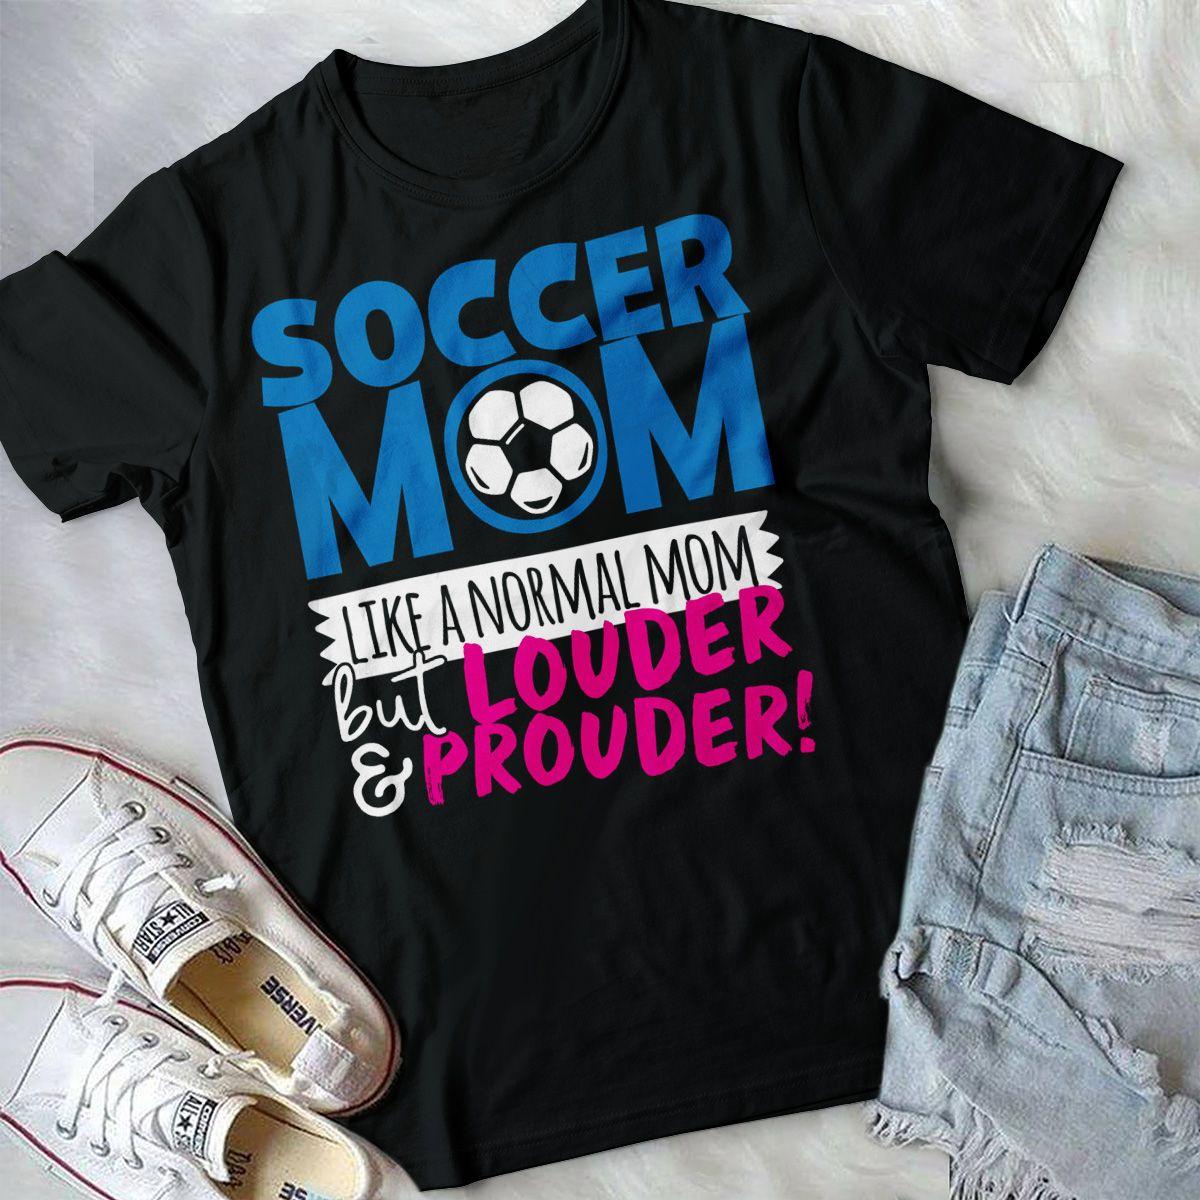 Cool Soccer Mom T Shirts Soccer Mom Shirt Sports Shirts Soccer Shirts